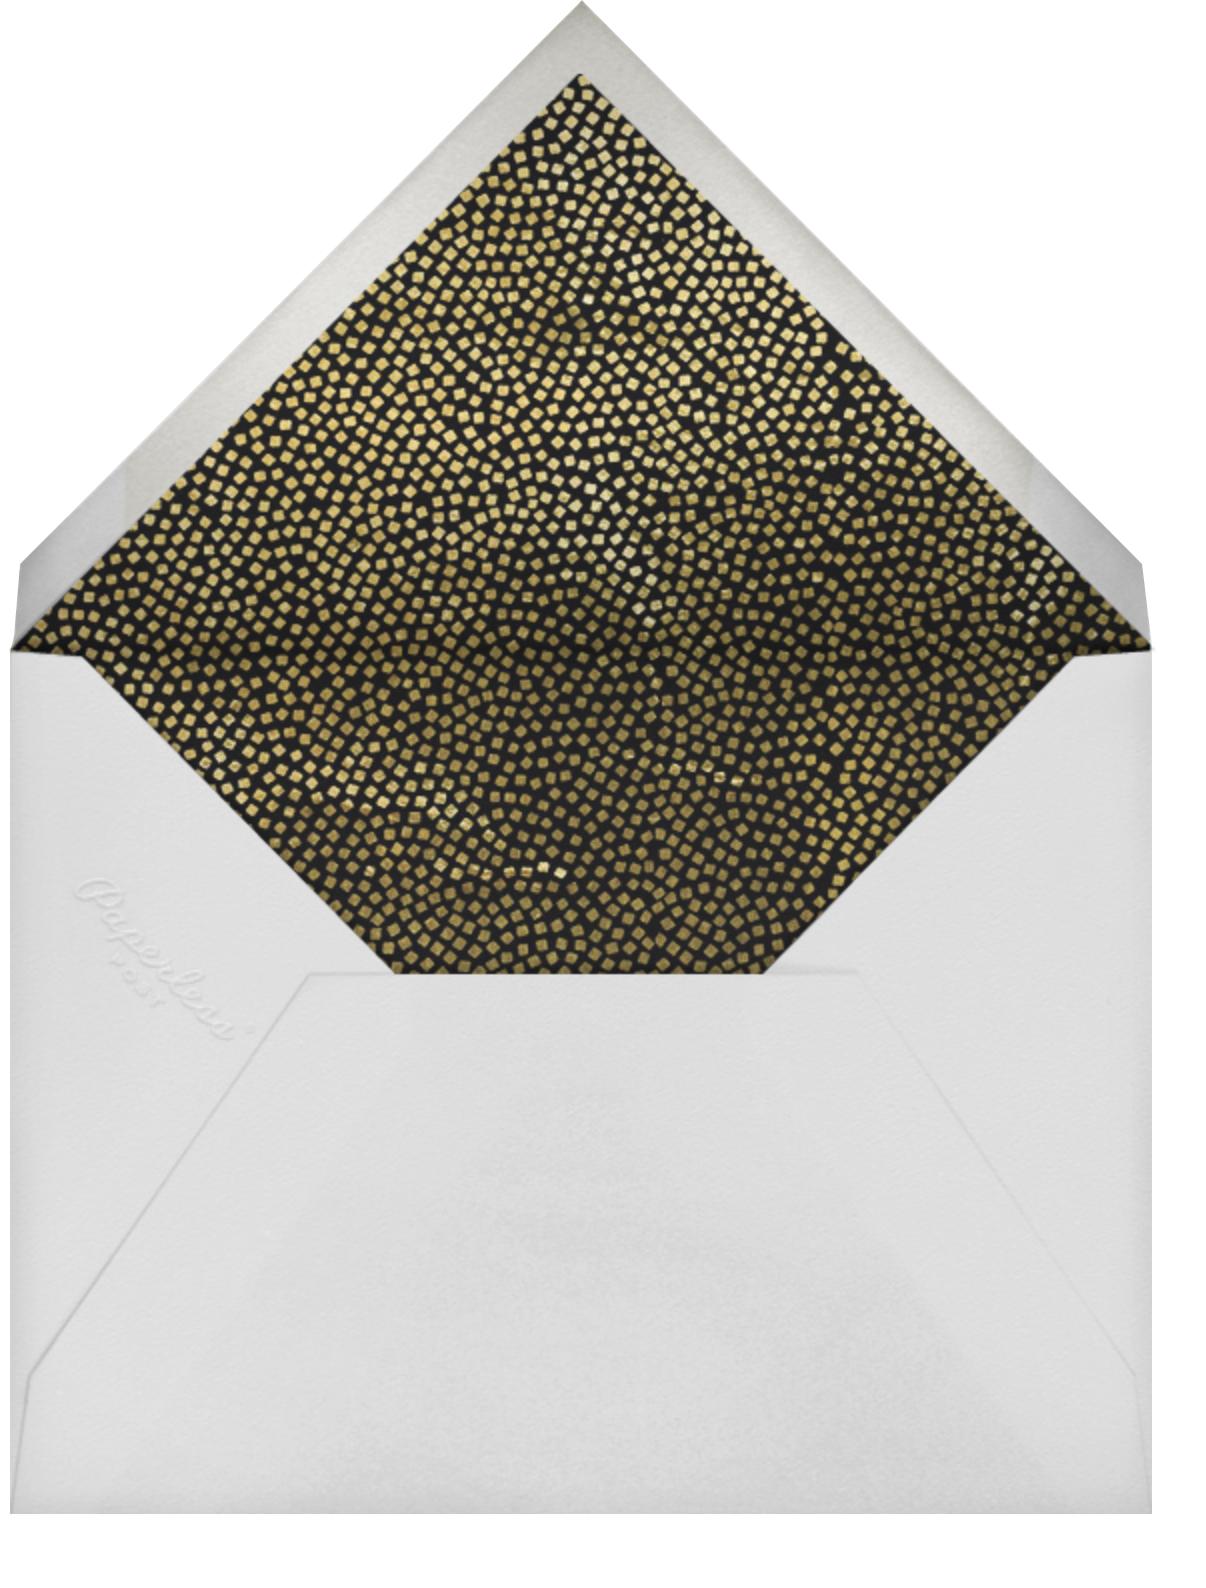 Konfetti (Photo) - Gold - Kelly Wearstler - Engagement party - envelope back